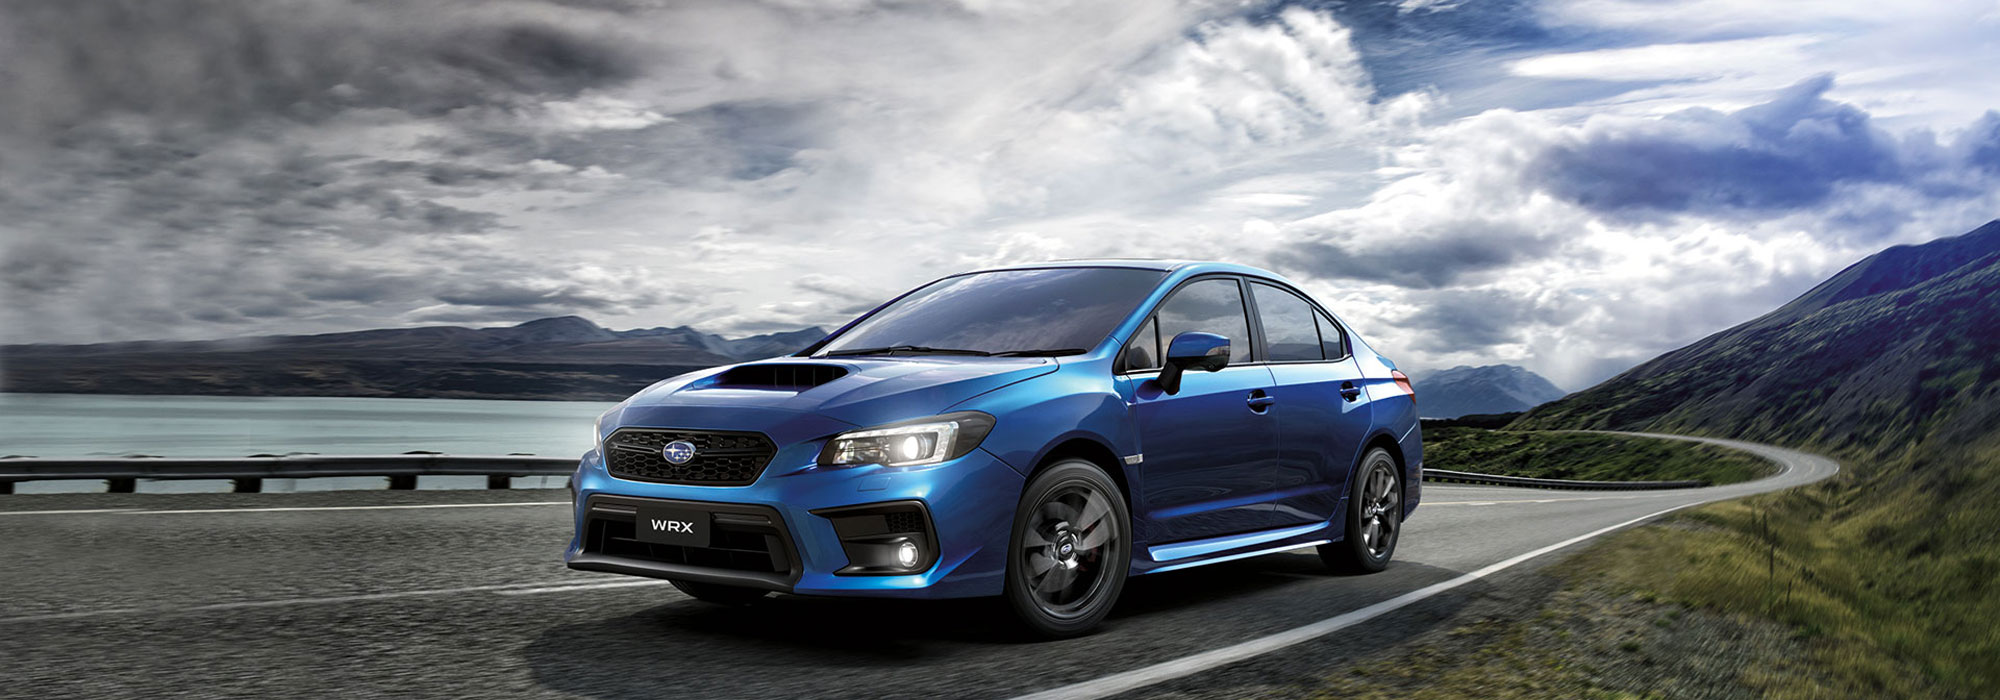 Automobilia Collectibles Strong-Willed 2012 Subaru Wrx Sti Australia Brochure Customers First